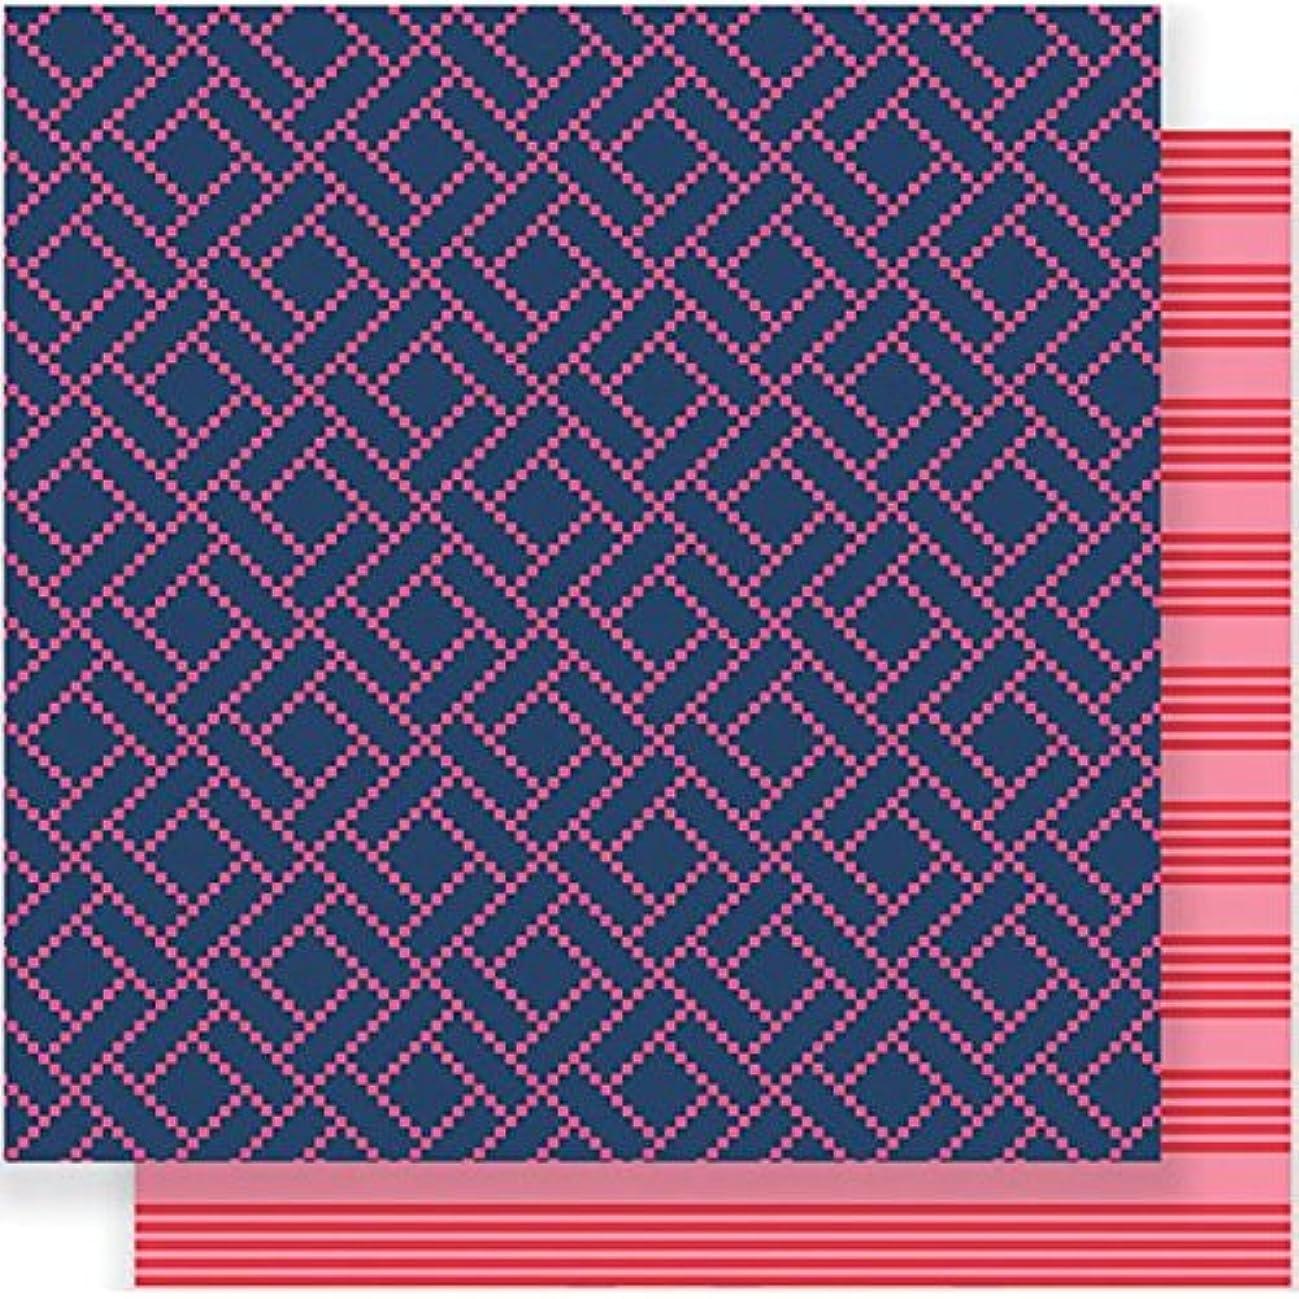 American Crafts 733060 25 Sheet Interlocked Jen Hadfield Everyday Double-Sided Cardstock, 12